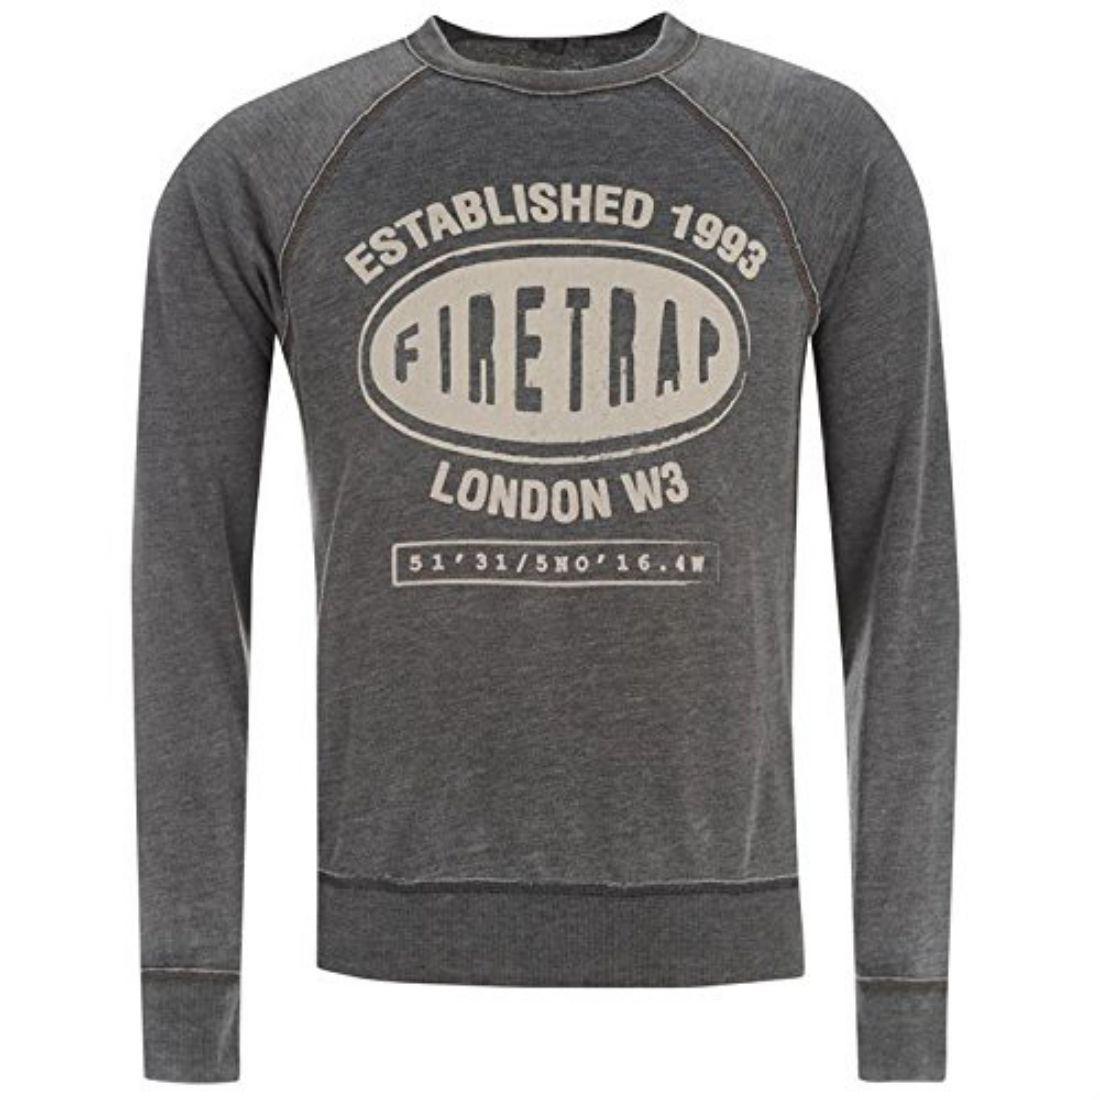 Firetrap Mens Sin Crew Sweatshirt Top Long Sleeves Print Clothing Brand New